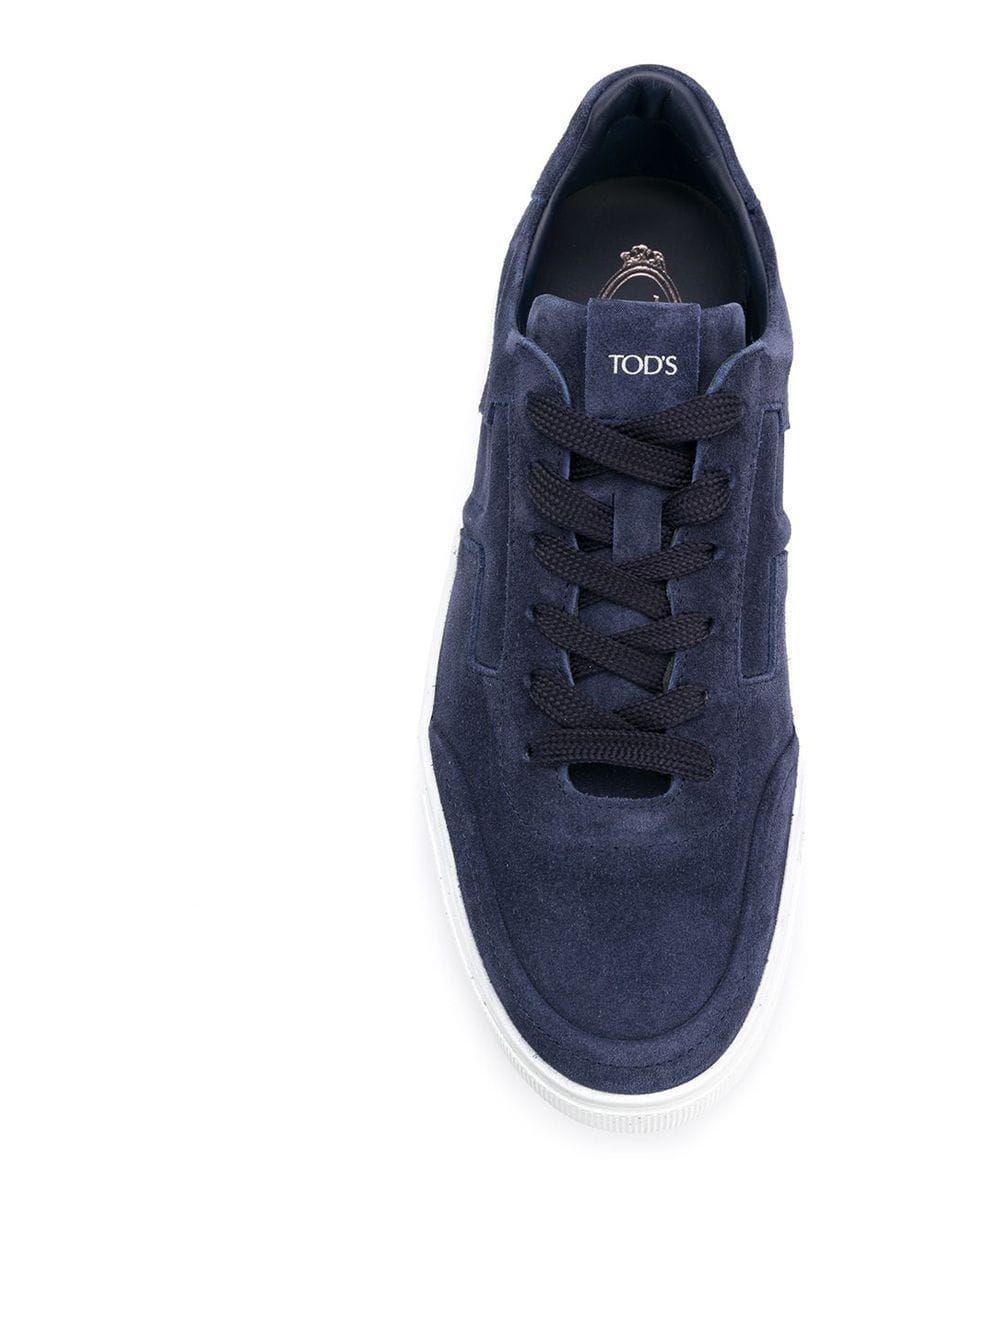 TOD'S MEN'S XXM0XY0AY40RE0U820 BLUE SUEDE SNEAKERS